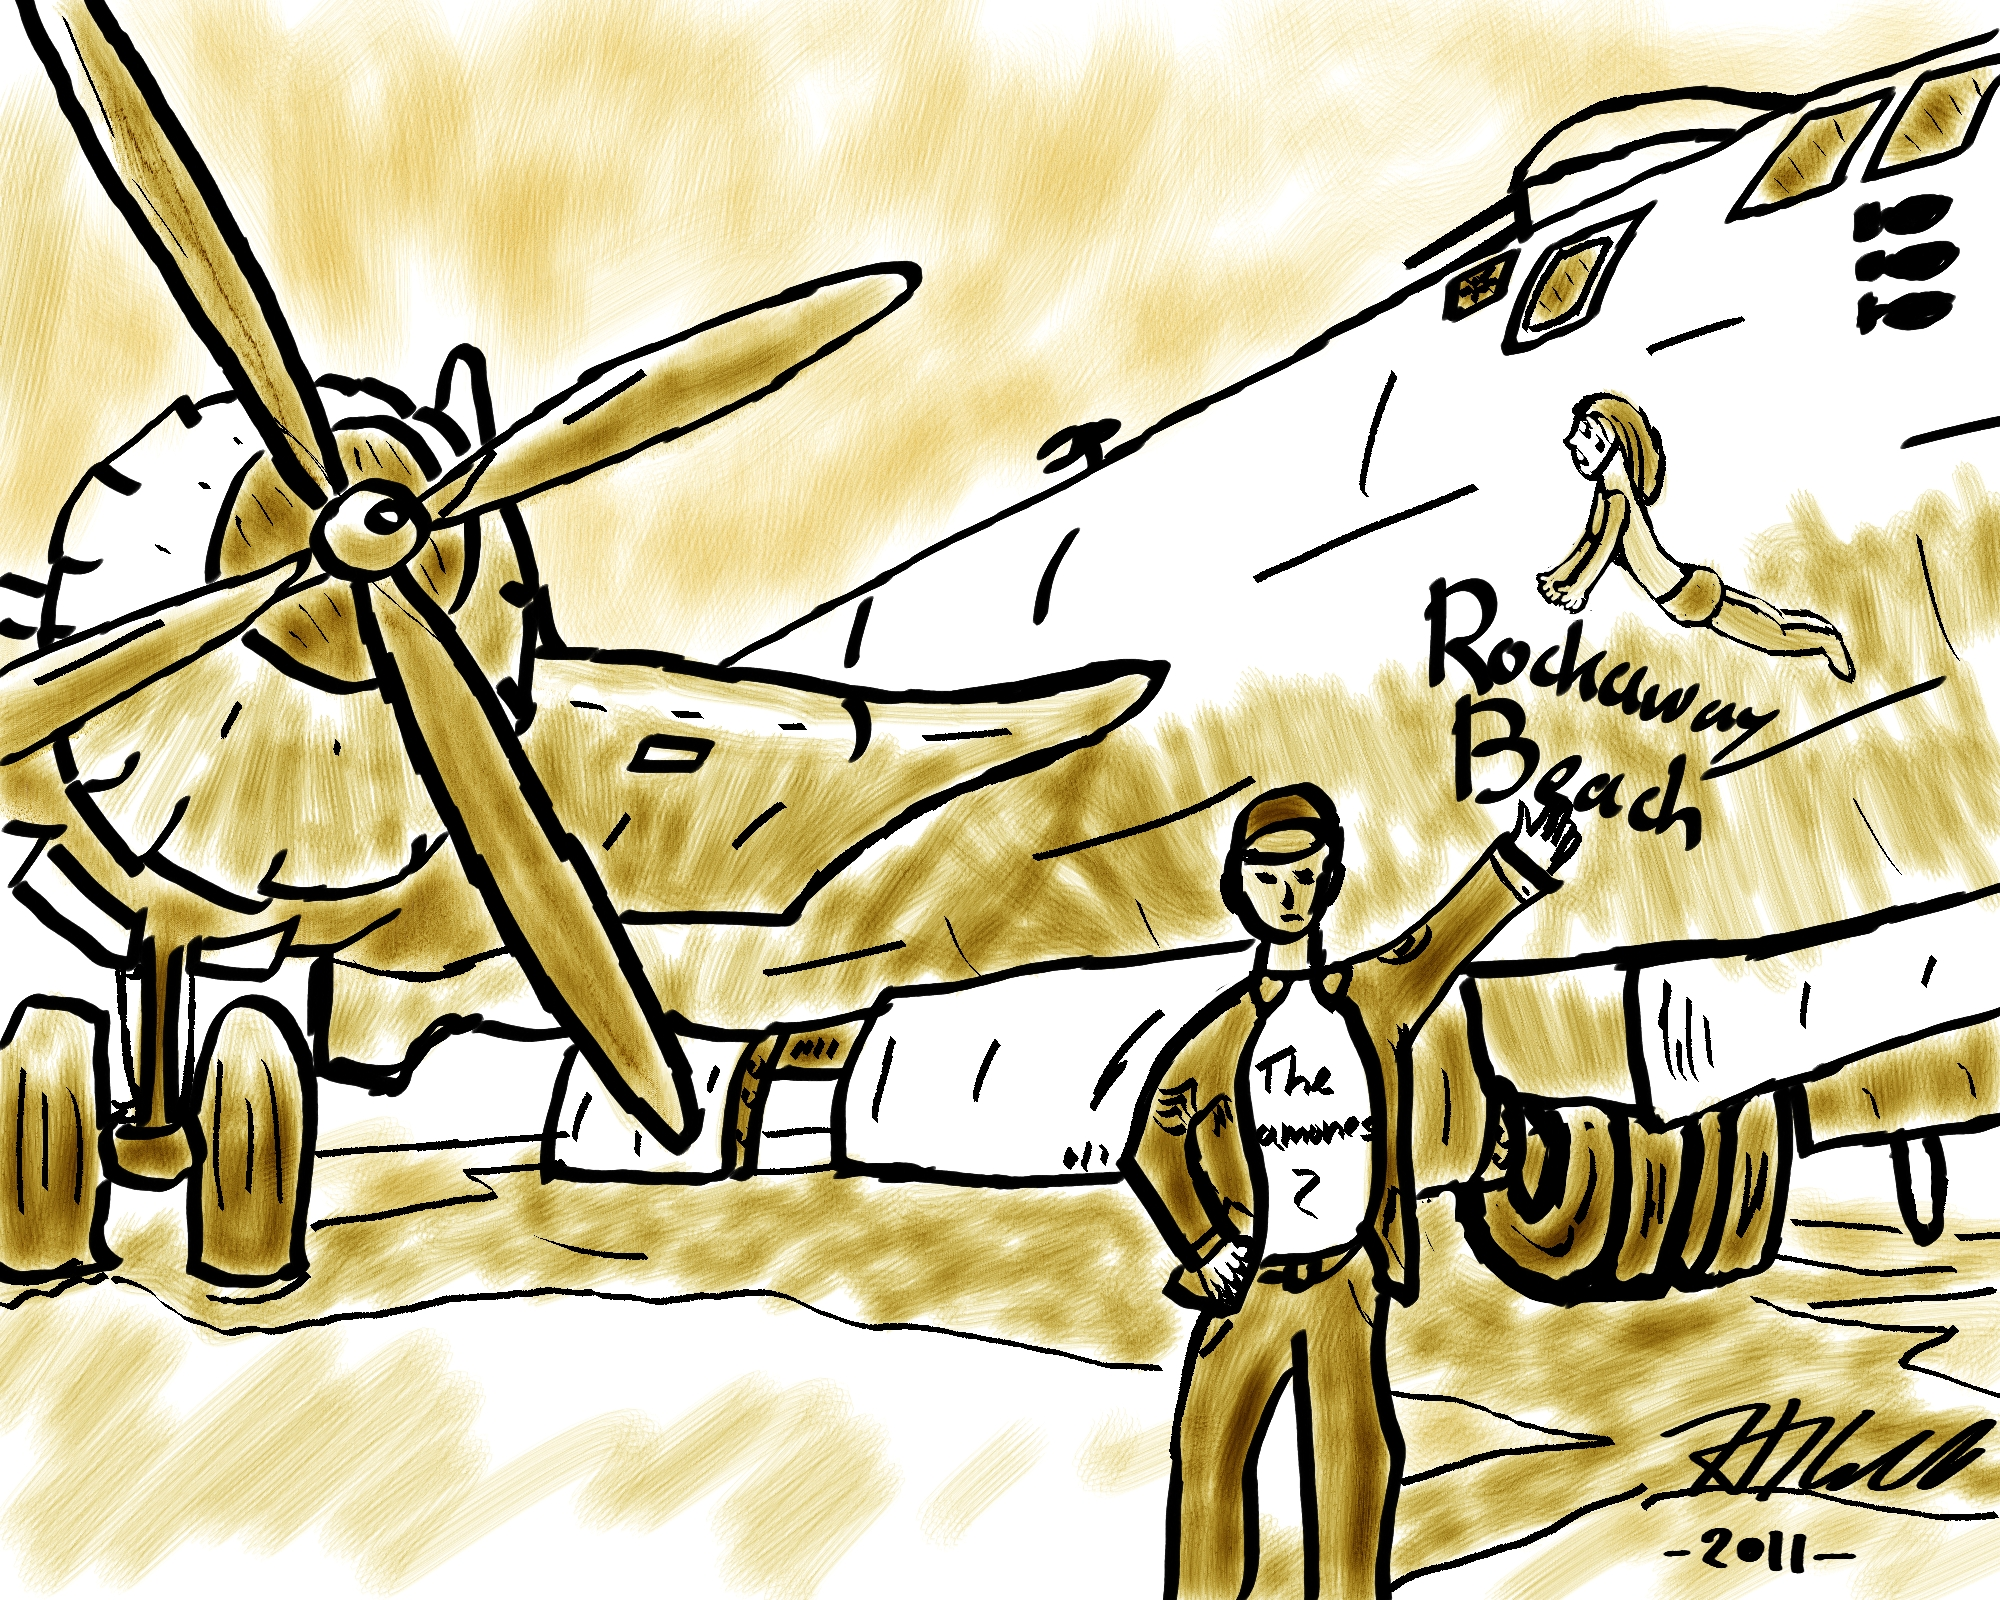 Ramones B-29.jpg